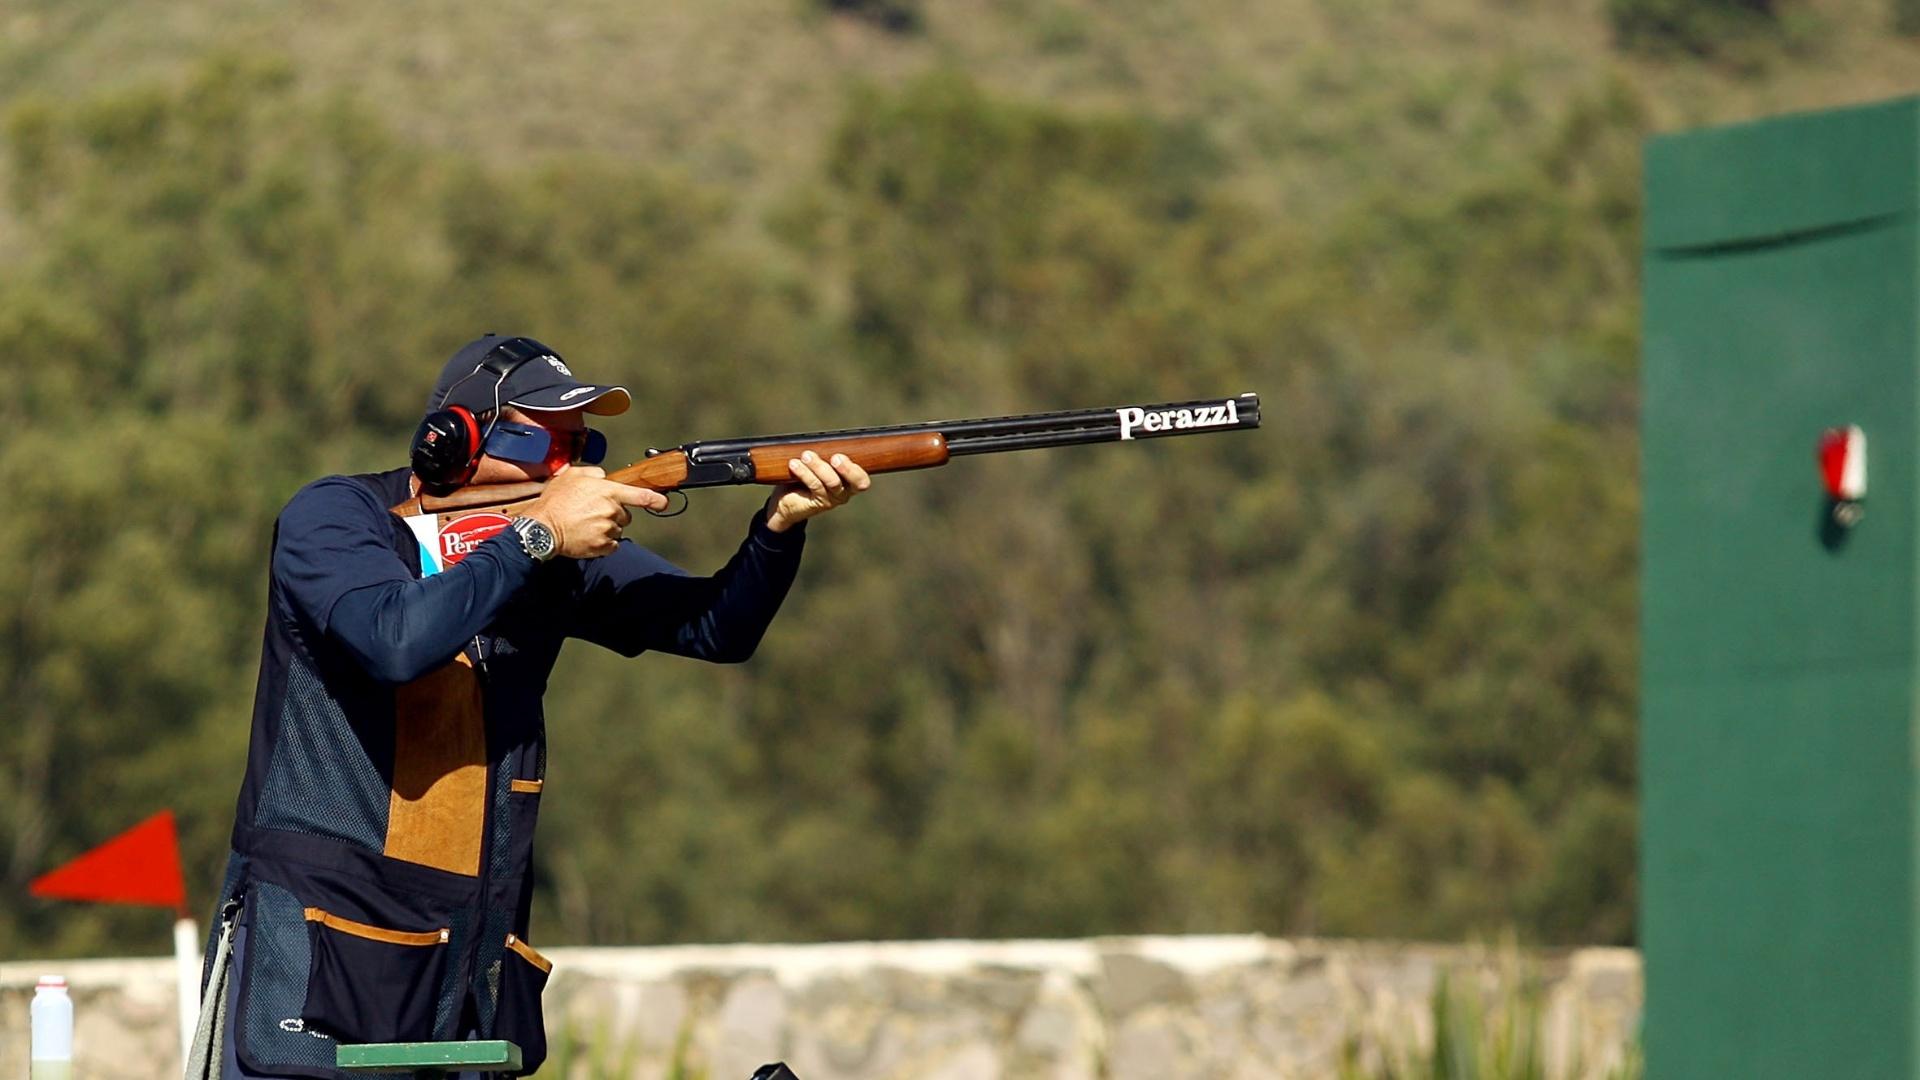 Roberto Schmits atira na prova da carabina de fossa e conquista a medalha de bronze no Pan de Guadalajara (19/10/2011)